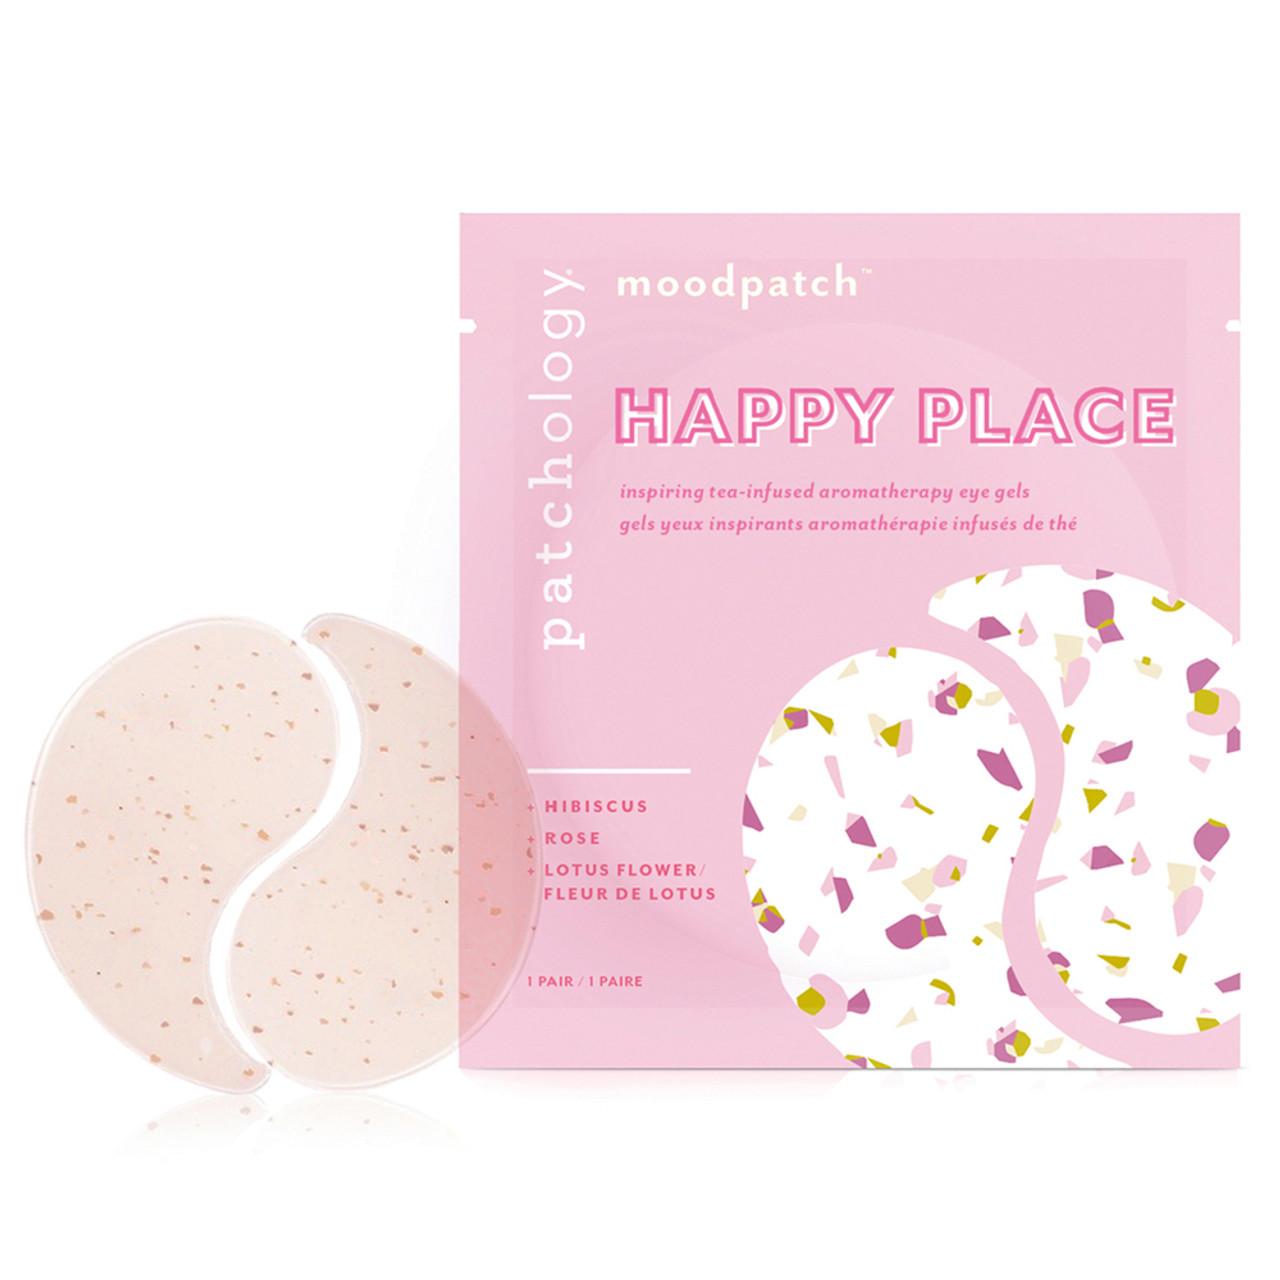 Patchology MoodPatch Happy Place Eye Gels (5-Pk) BeautifiedYou.com